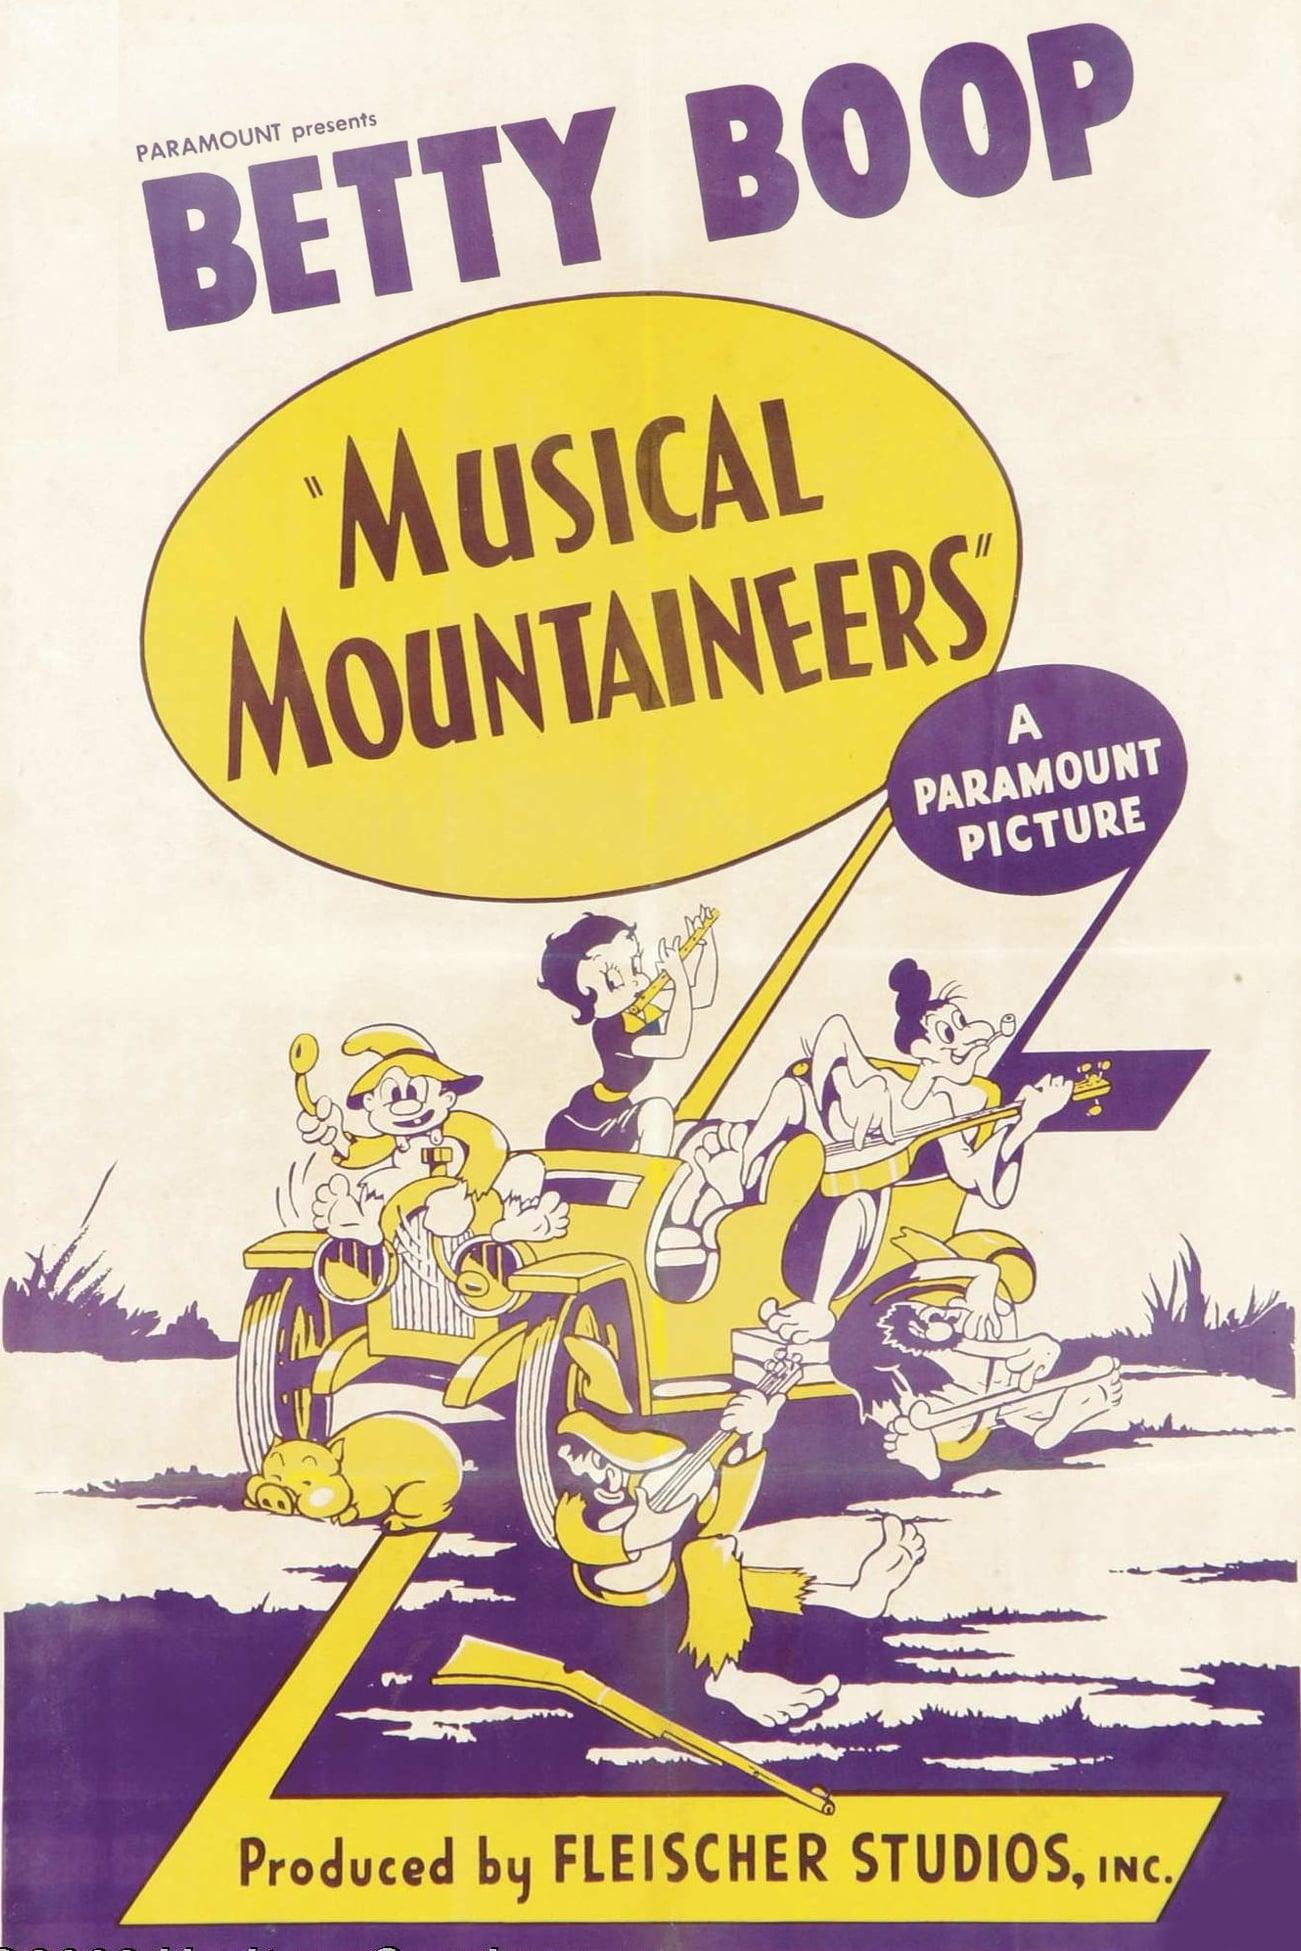 Musical Mountaineers